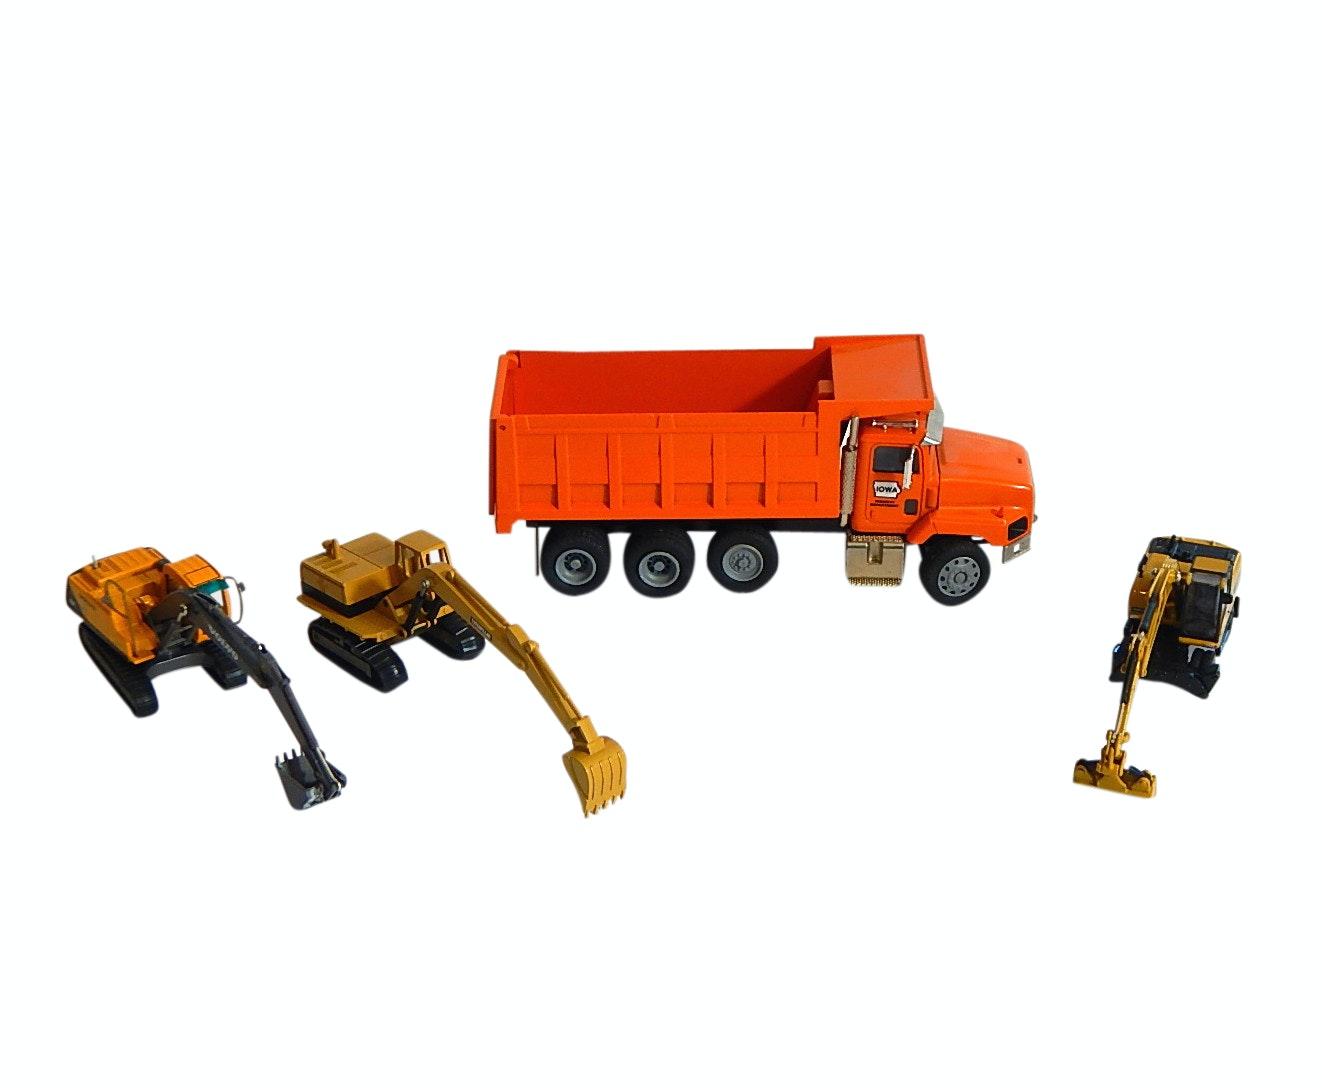 Die Cast Iowa Highway Dept. Dump Truck and Three Excavators with Volvo